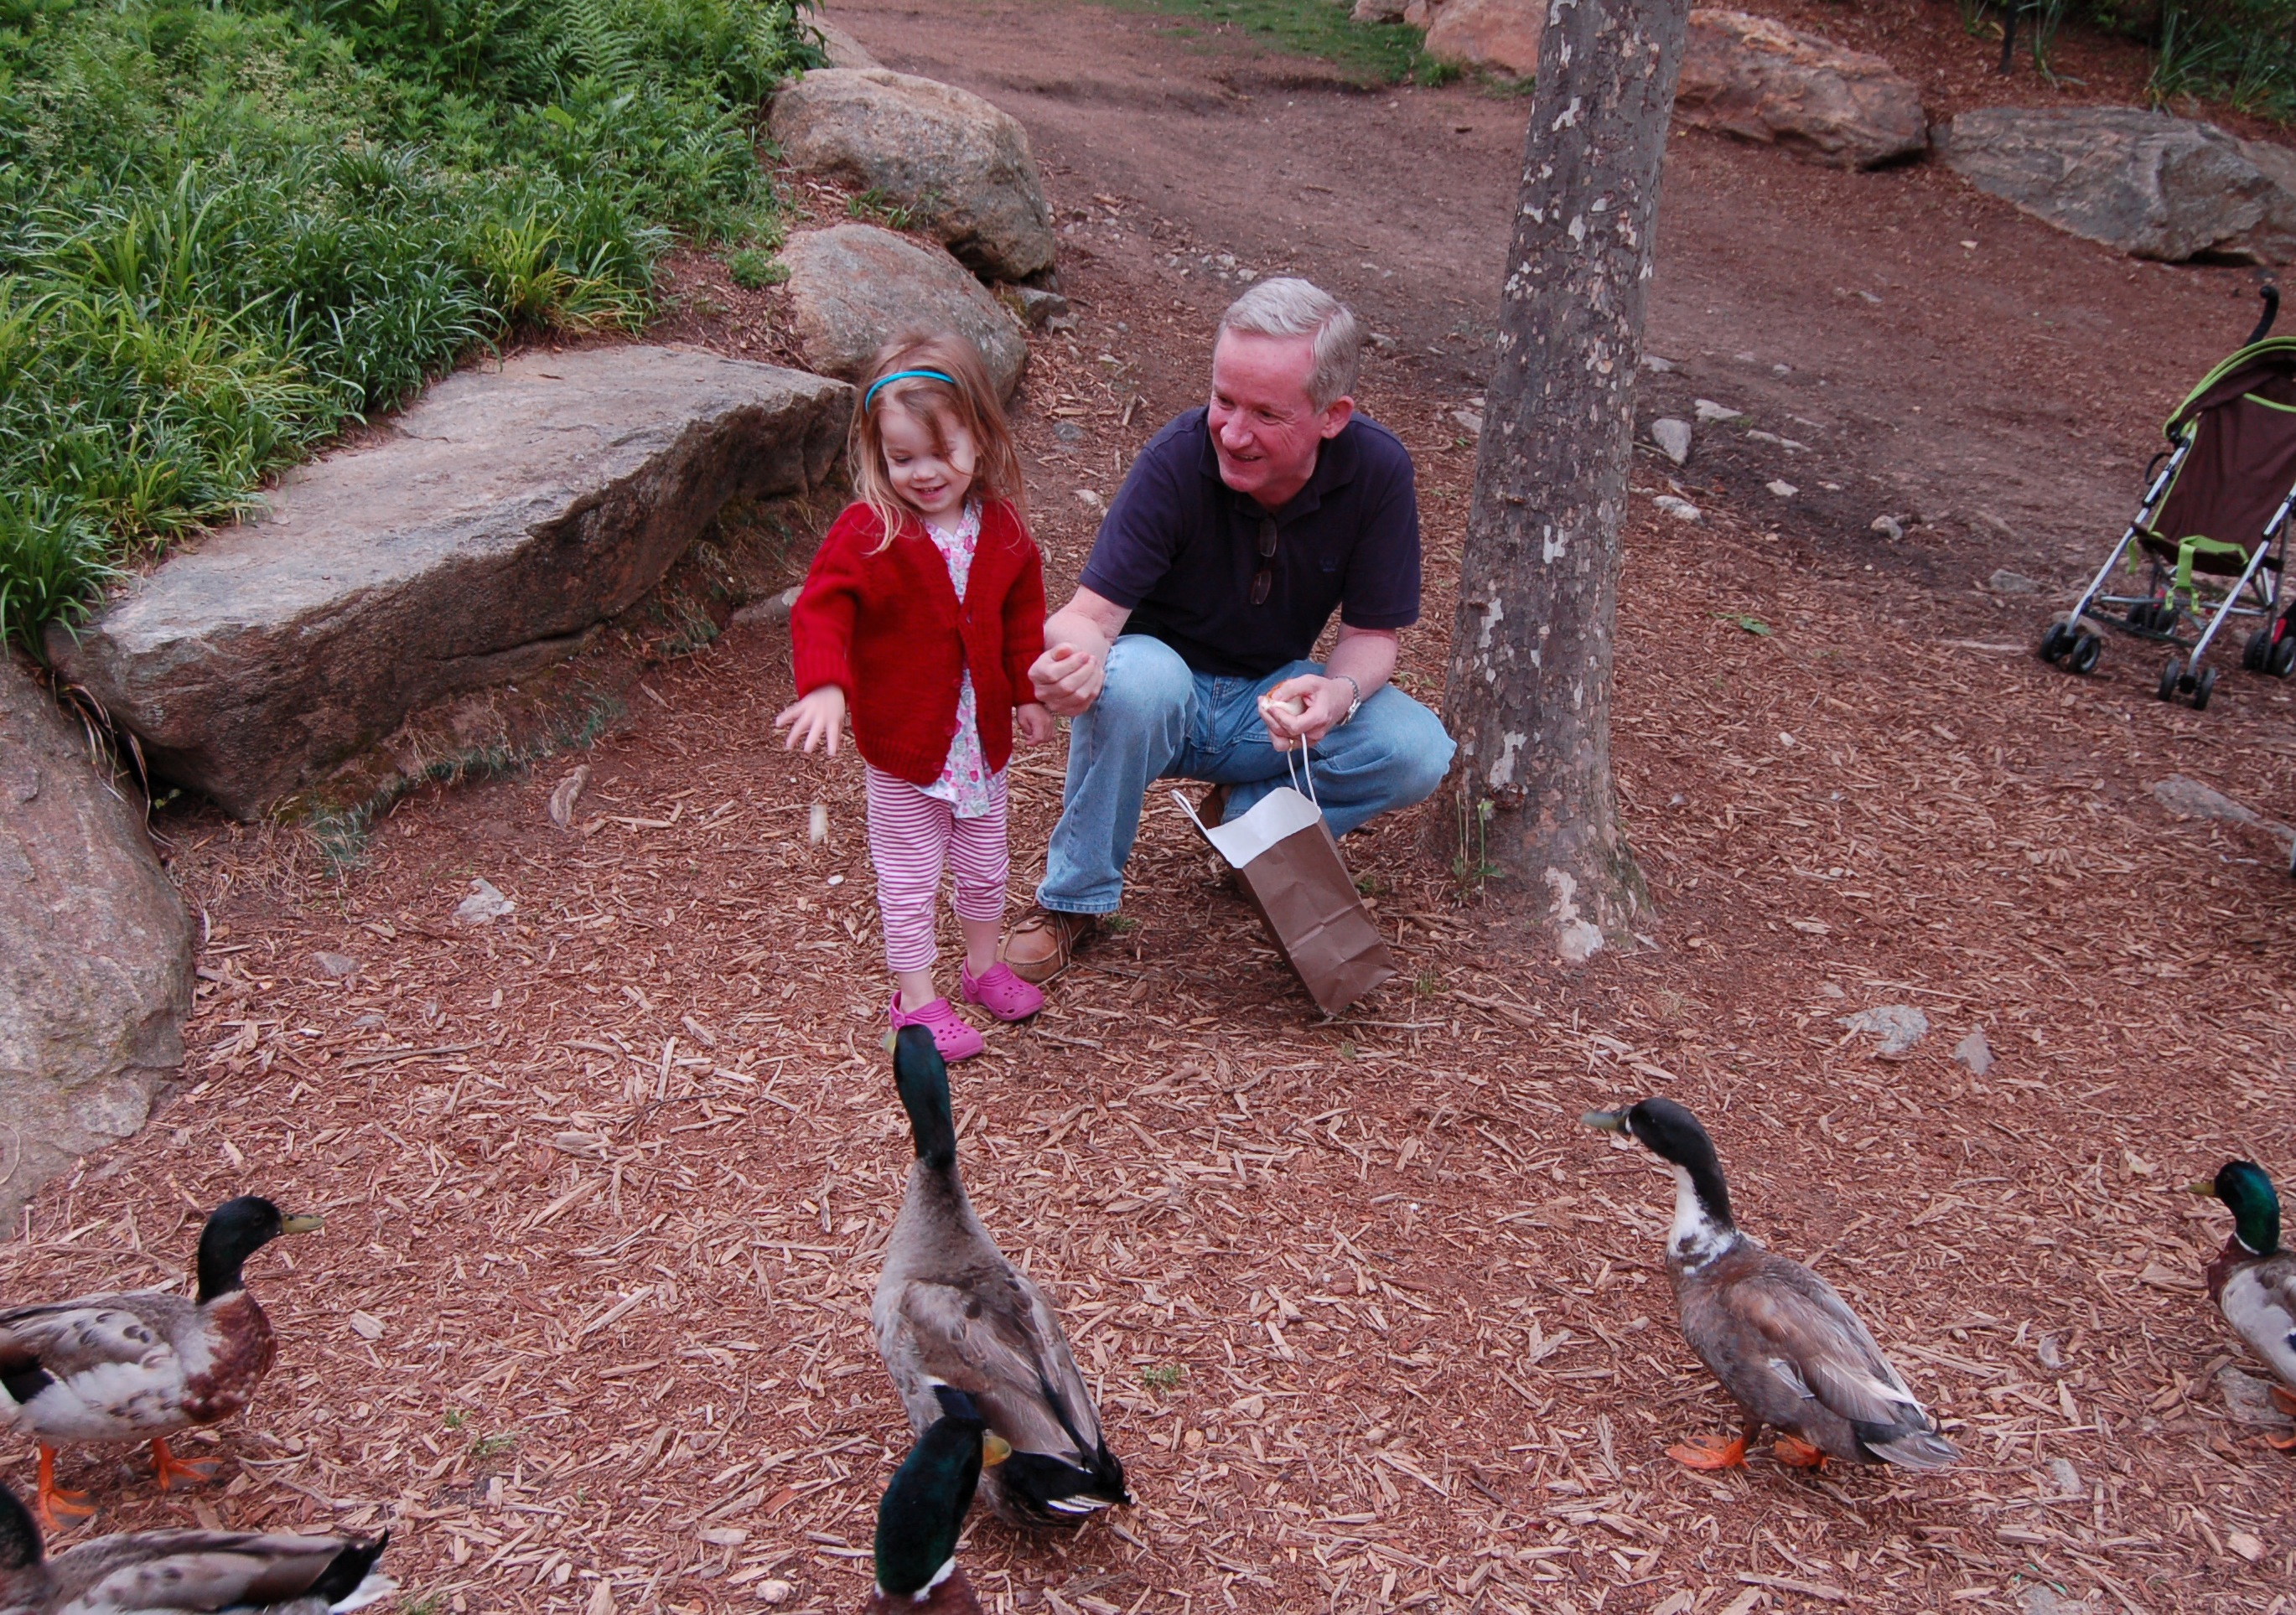 Gotta feel feeding the ducks love